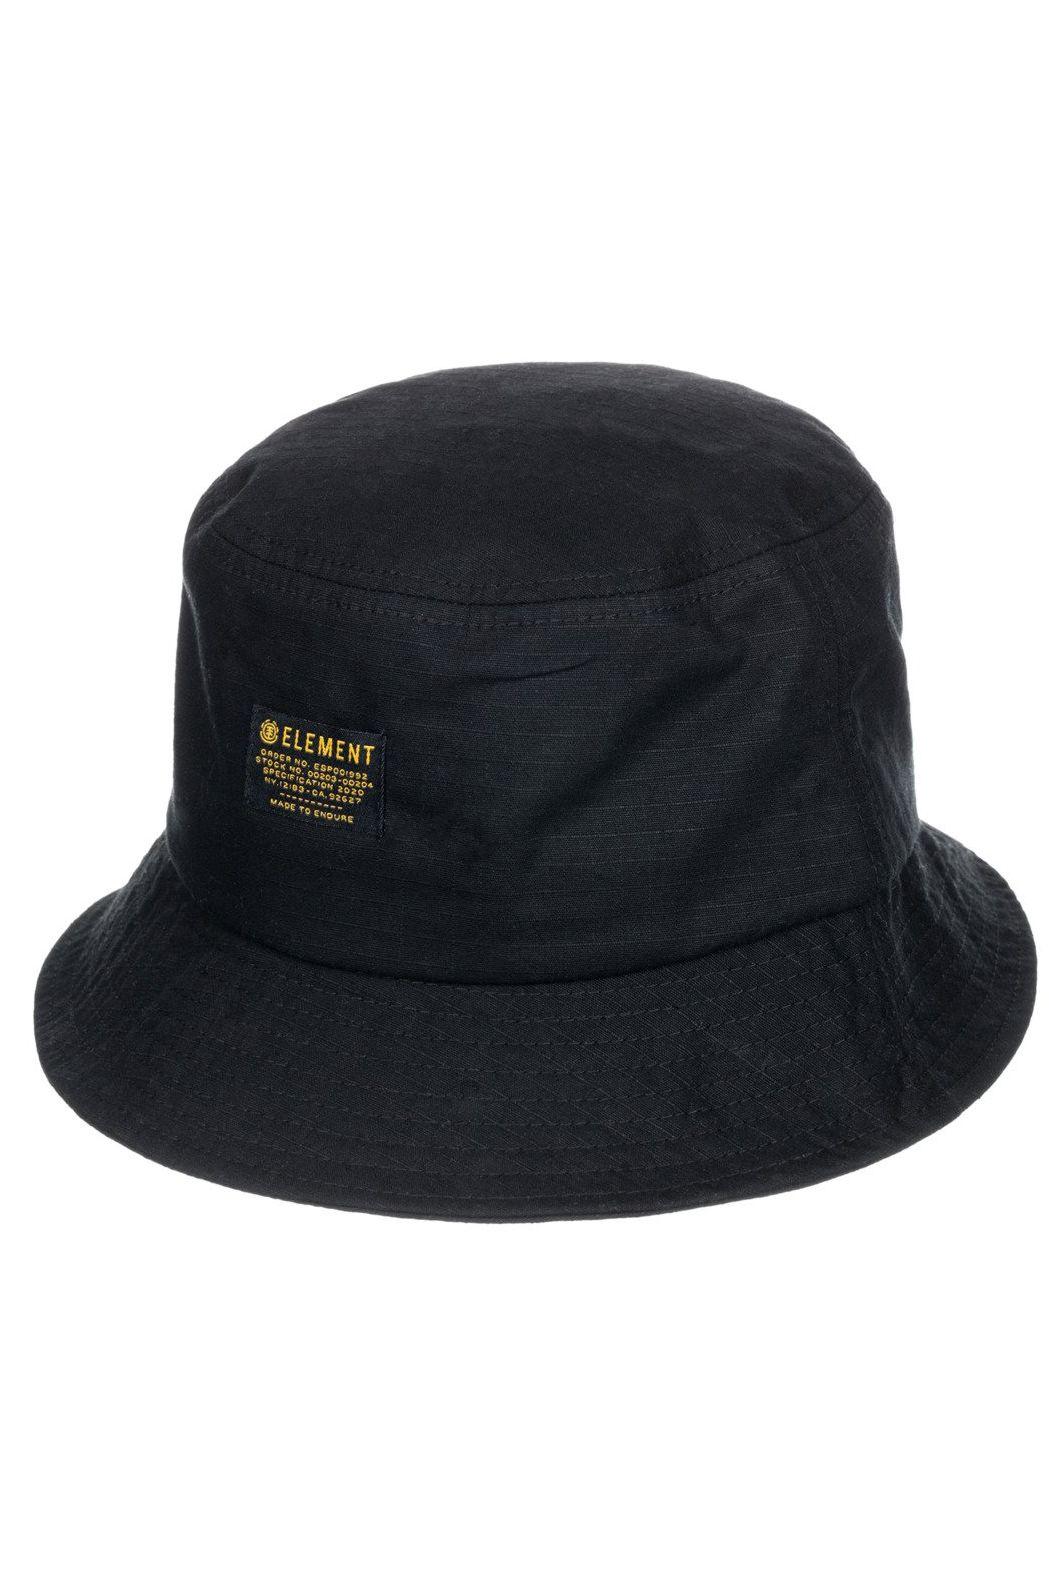 Element Cap EAGER BUCKET HAT Flint Black